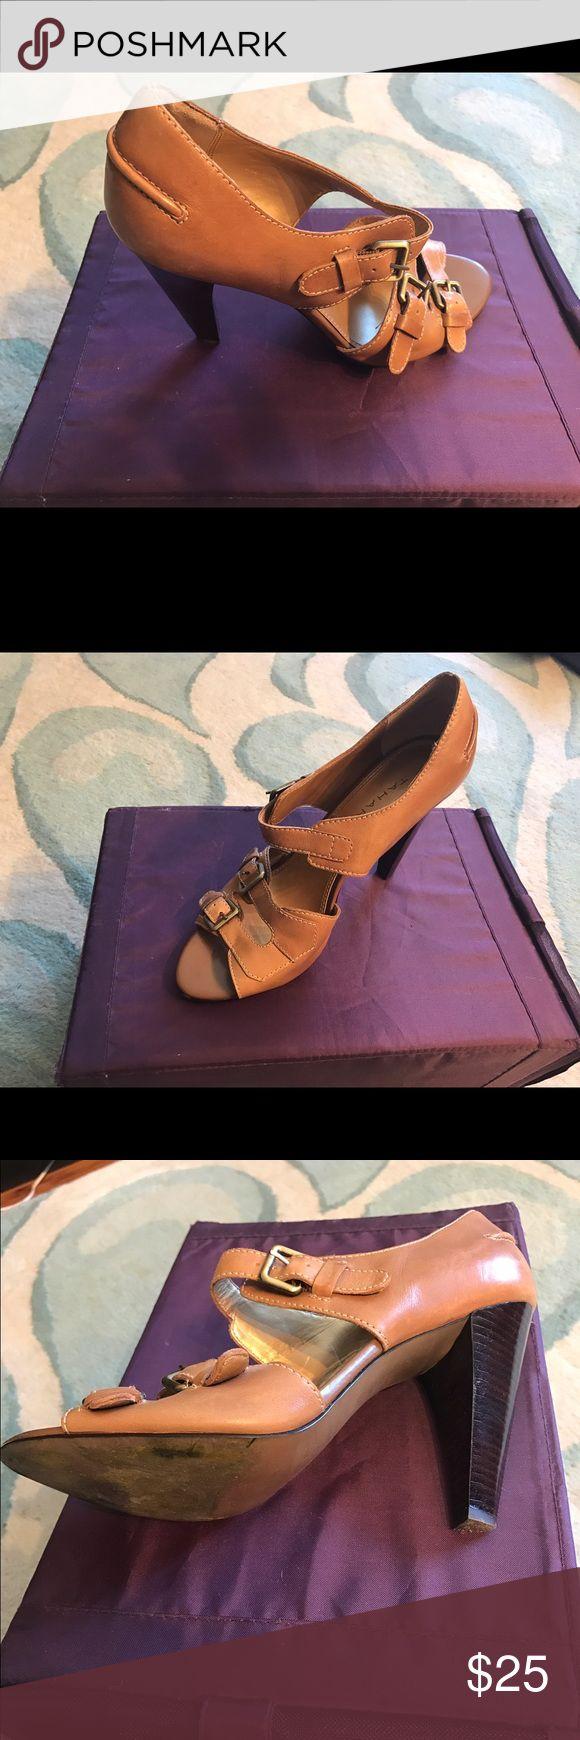 Tahari Camel high heel sandal size 8 Barely worn, fun, trendy sandal. Tahari Shoes Sandals